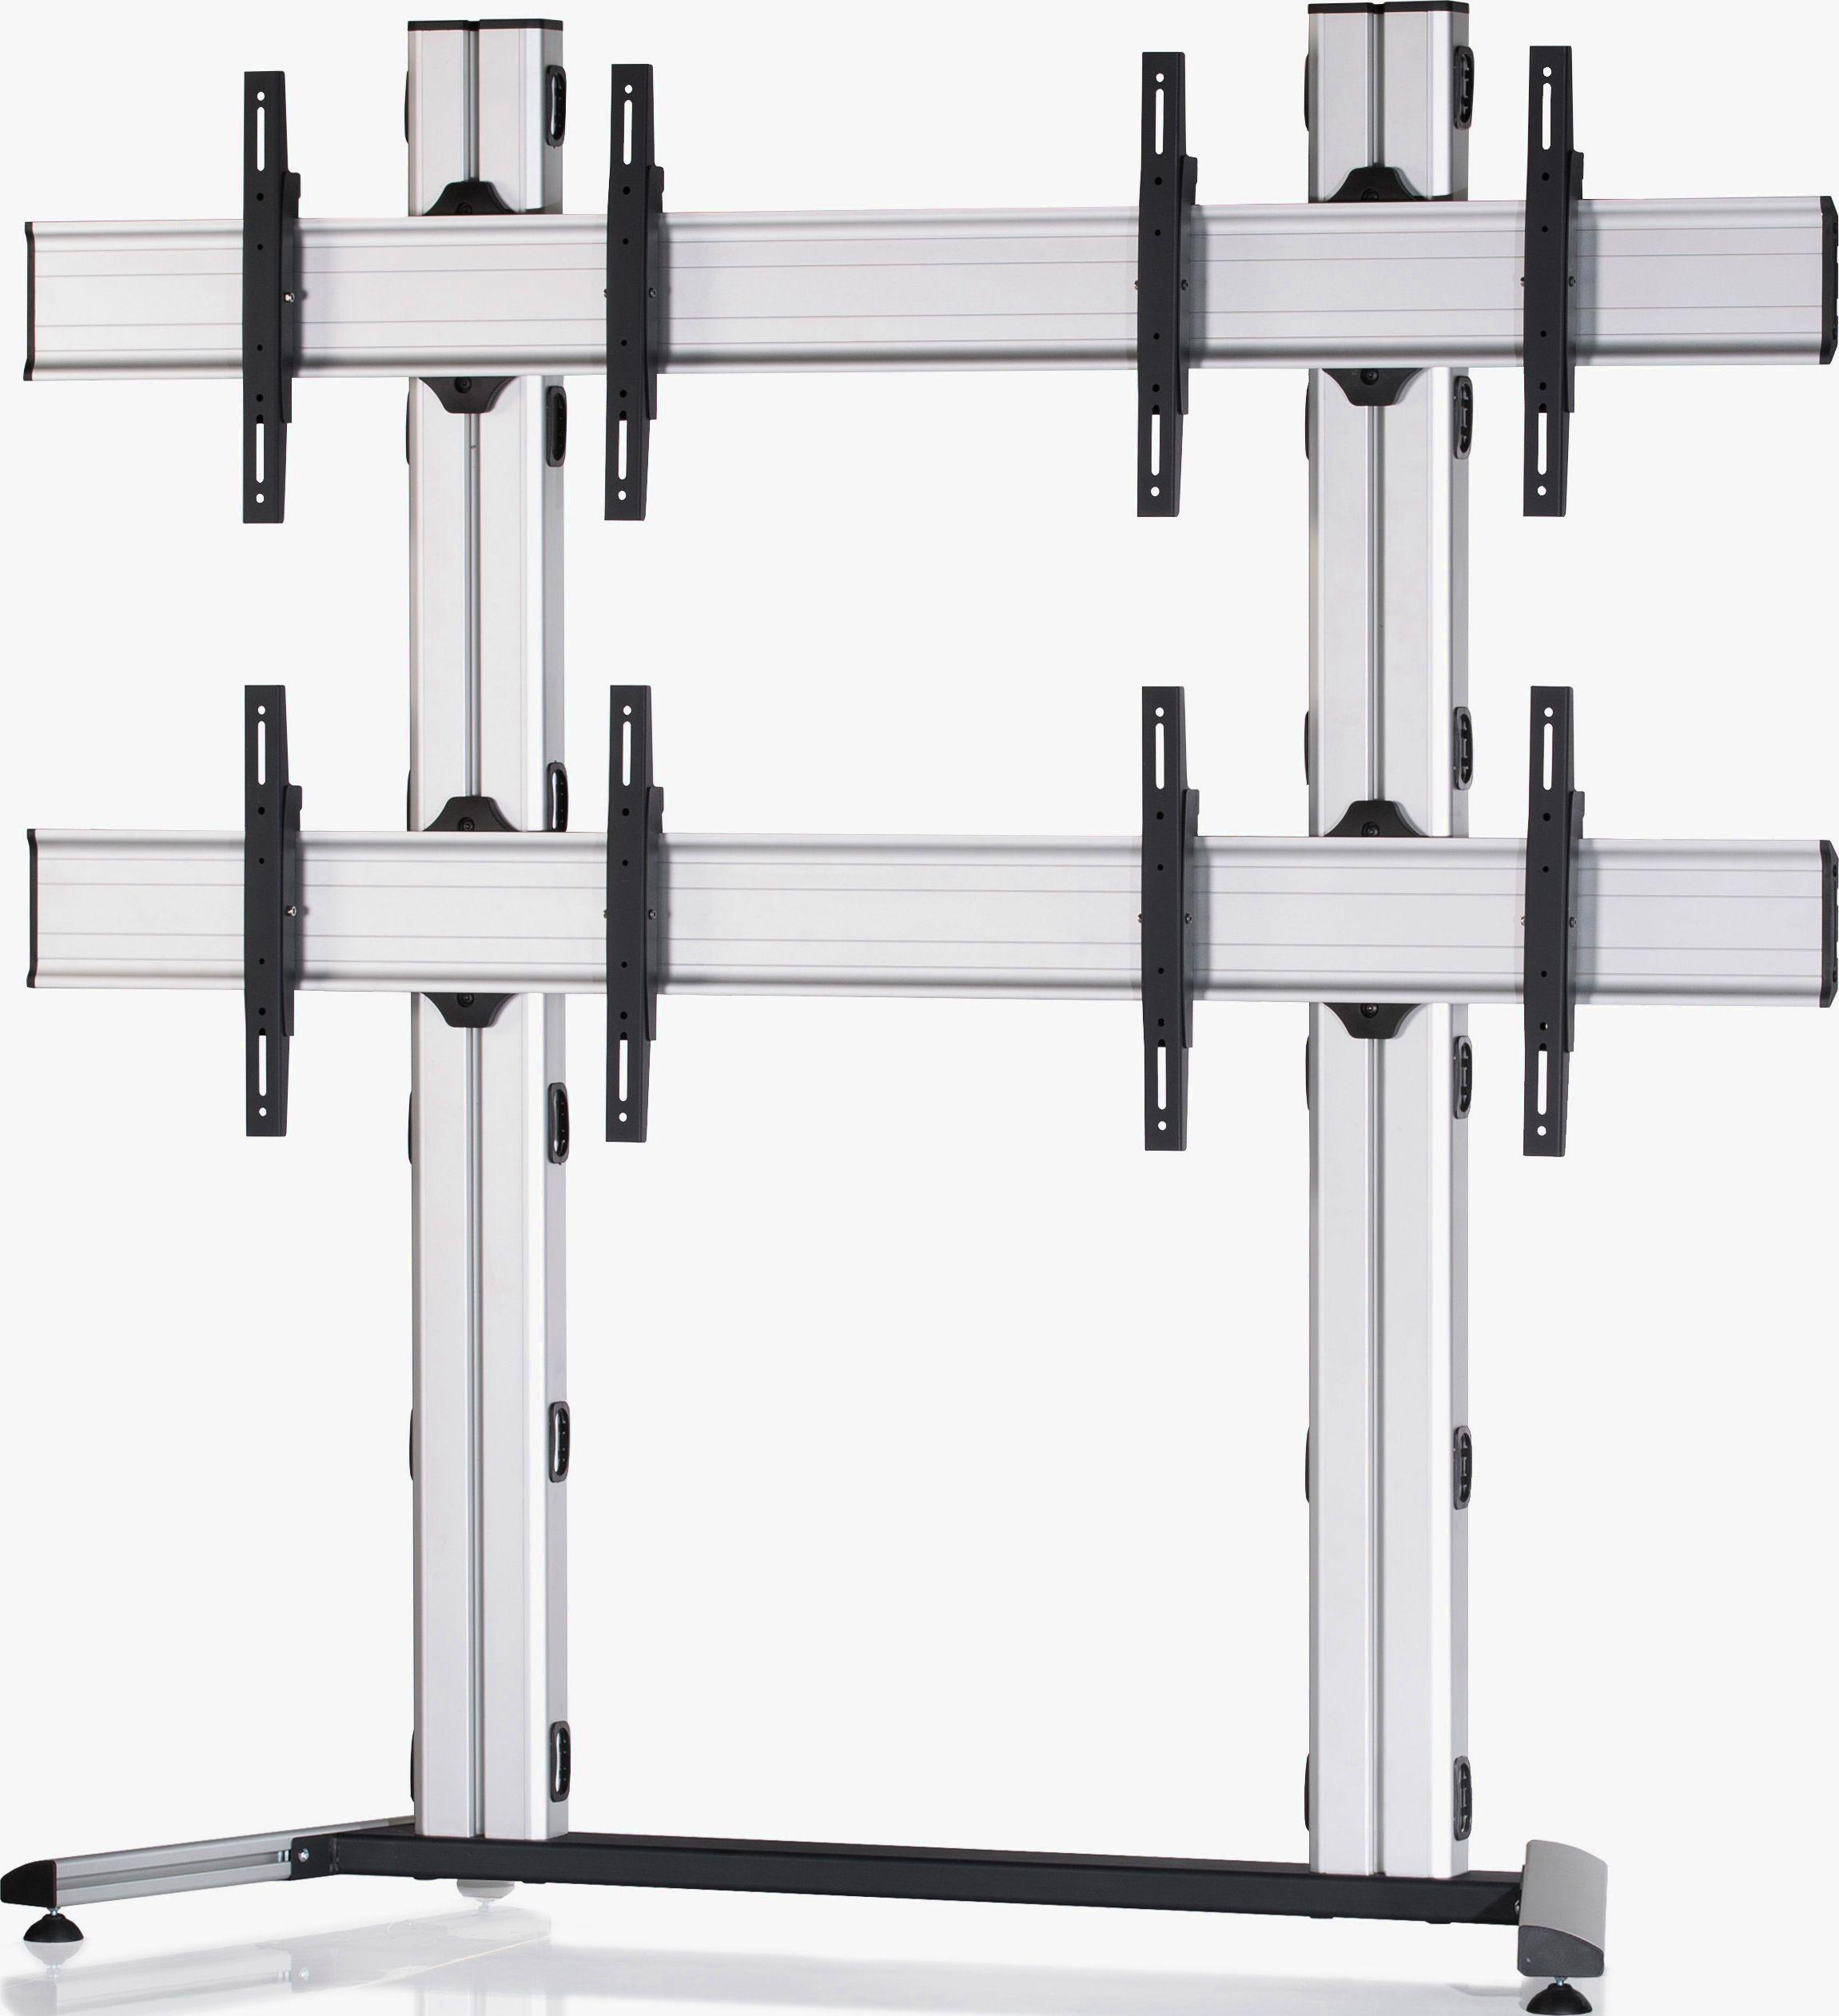 4 Displays 2x2, Standard-VESA, auf Standfuß